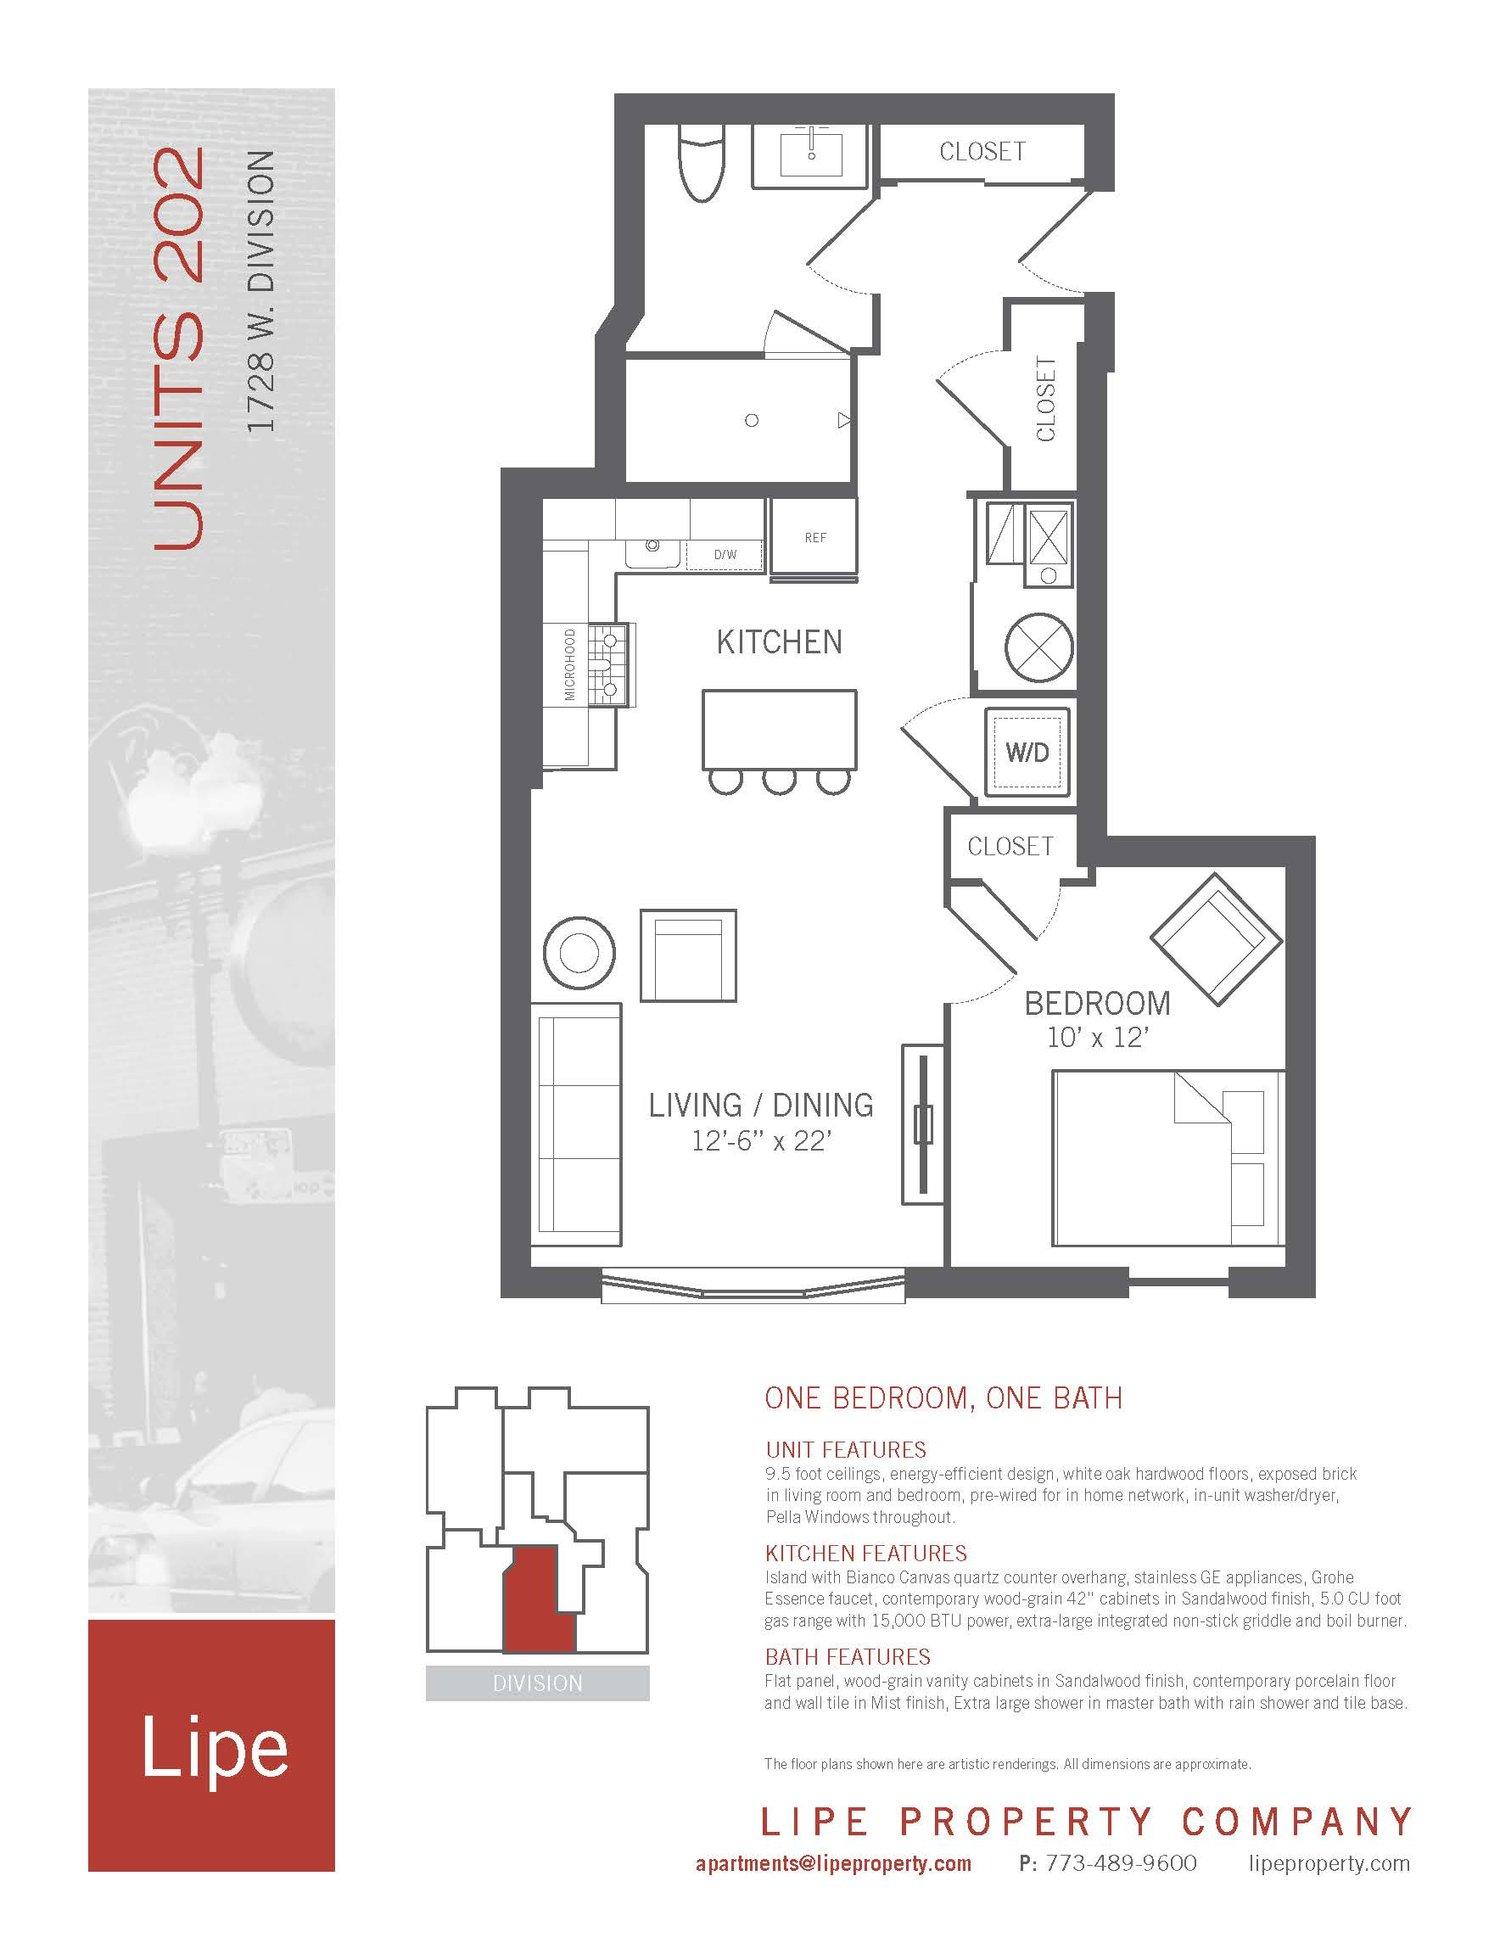 1728-West-Division-202-Floorplan-Chicago-apartment-for-rent.jpg